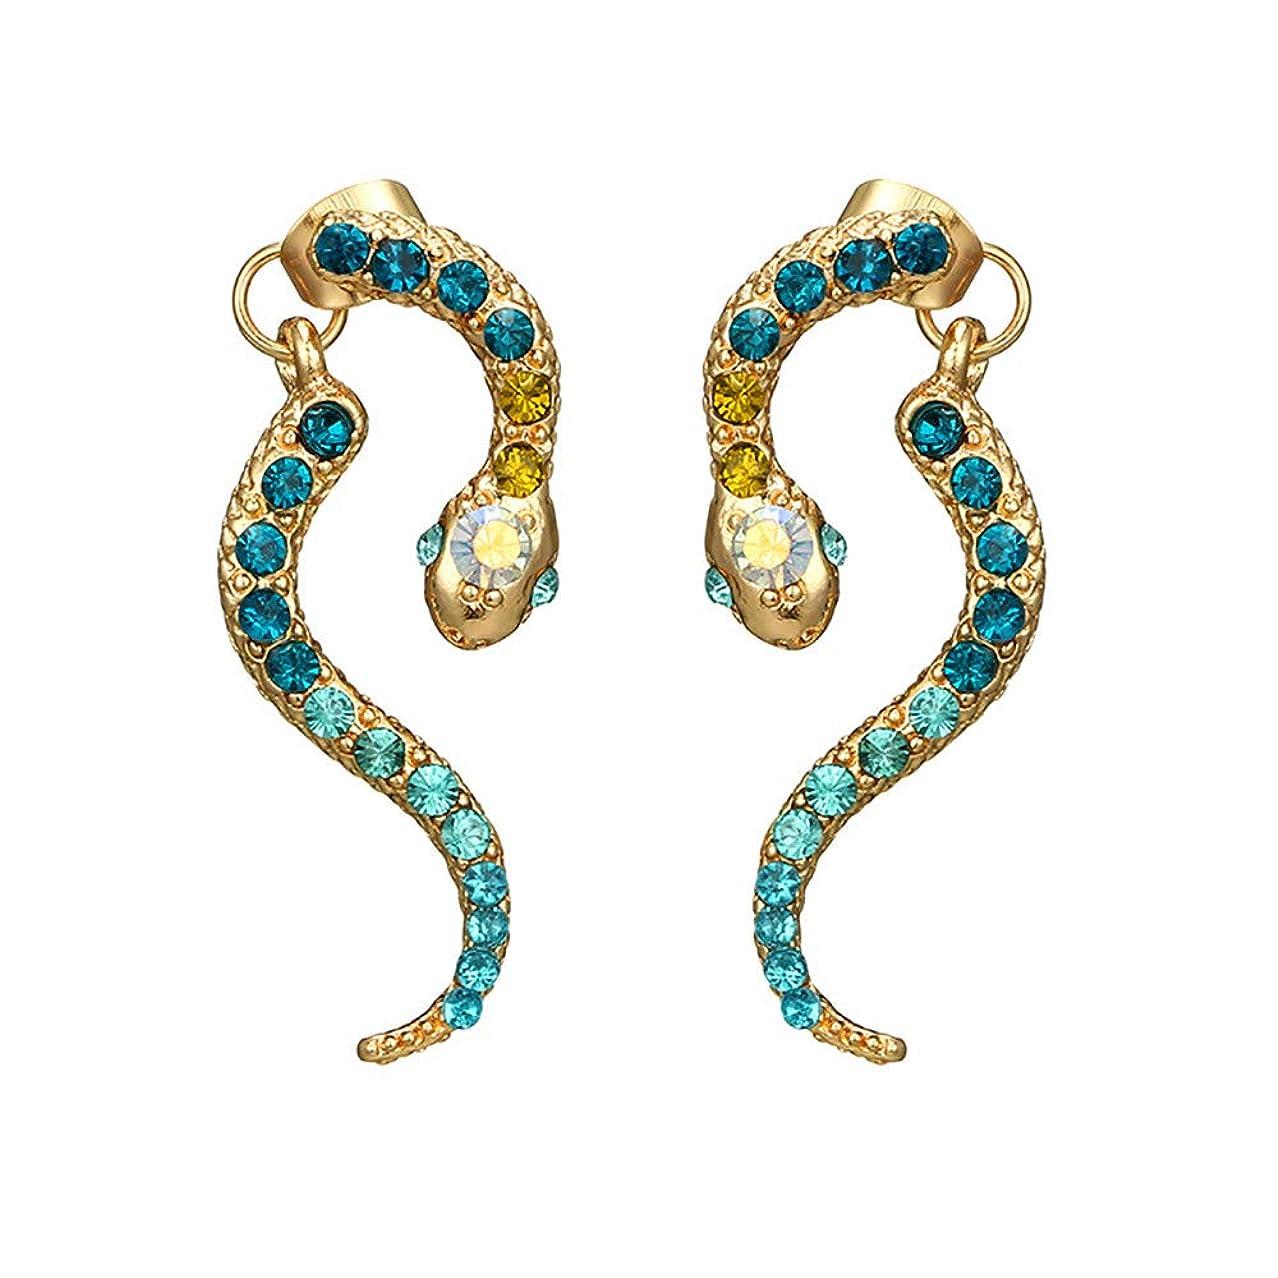 Nicircle 女性ヴィンテージパーソナリティゾディアックヘビ型ダイヤモンドイヤリング動物合金のイヤリング Women Vintage Personality Zodiac Snake-shaped Diamond Earrings Animal Alloy Earrings